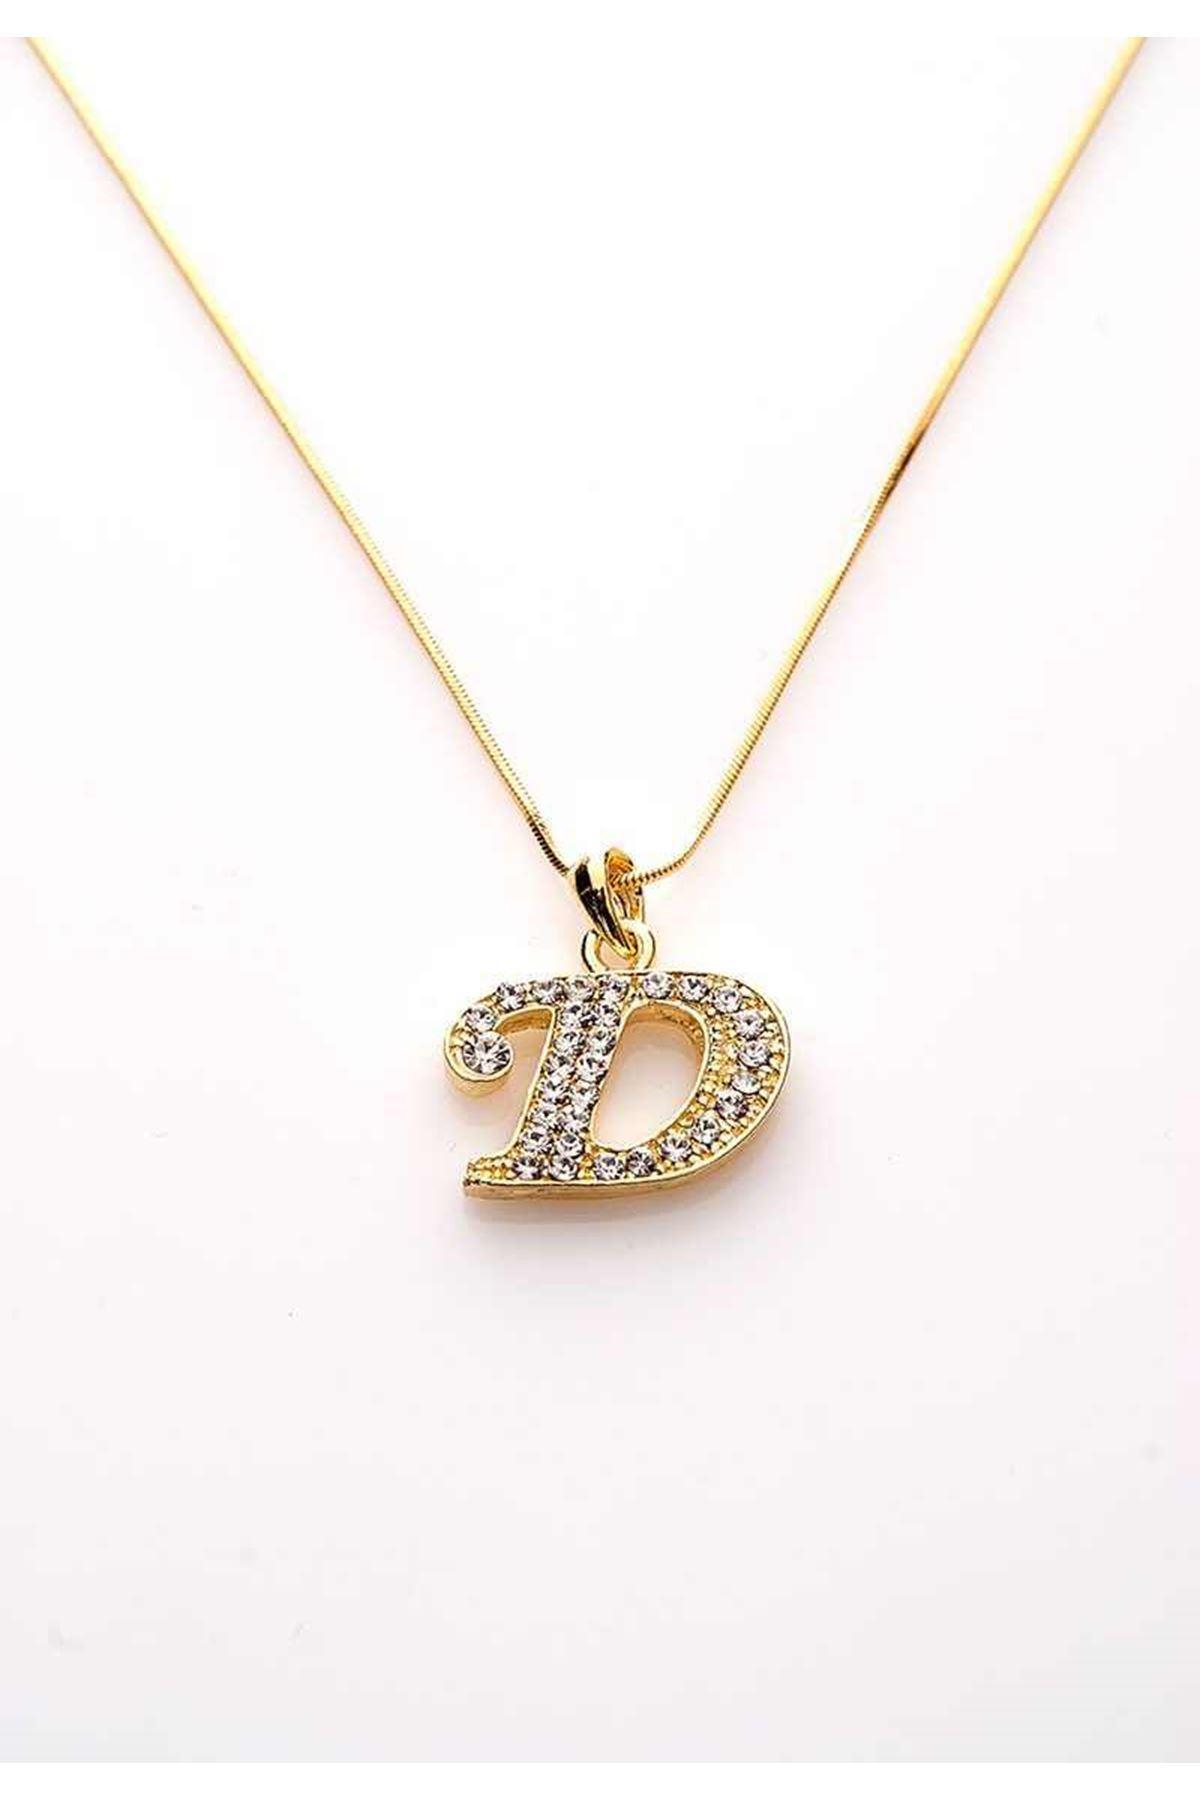 Gold Taşlı D Harf Kolye 11Ç-107840